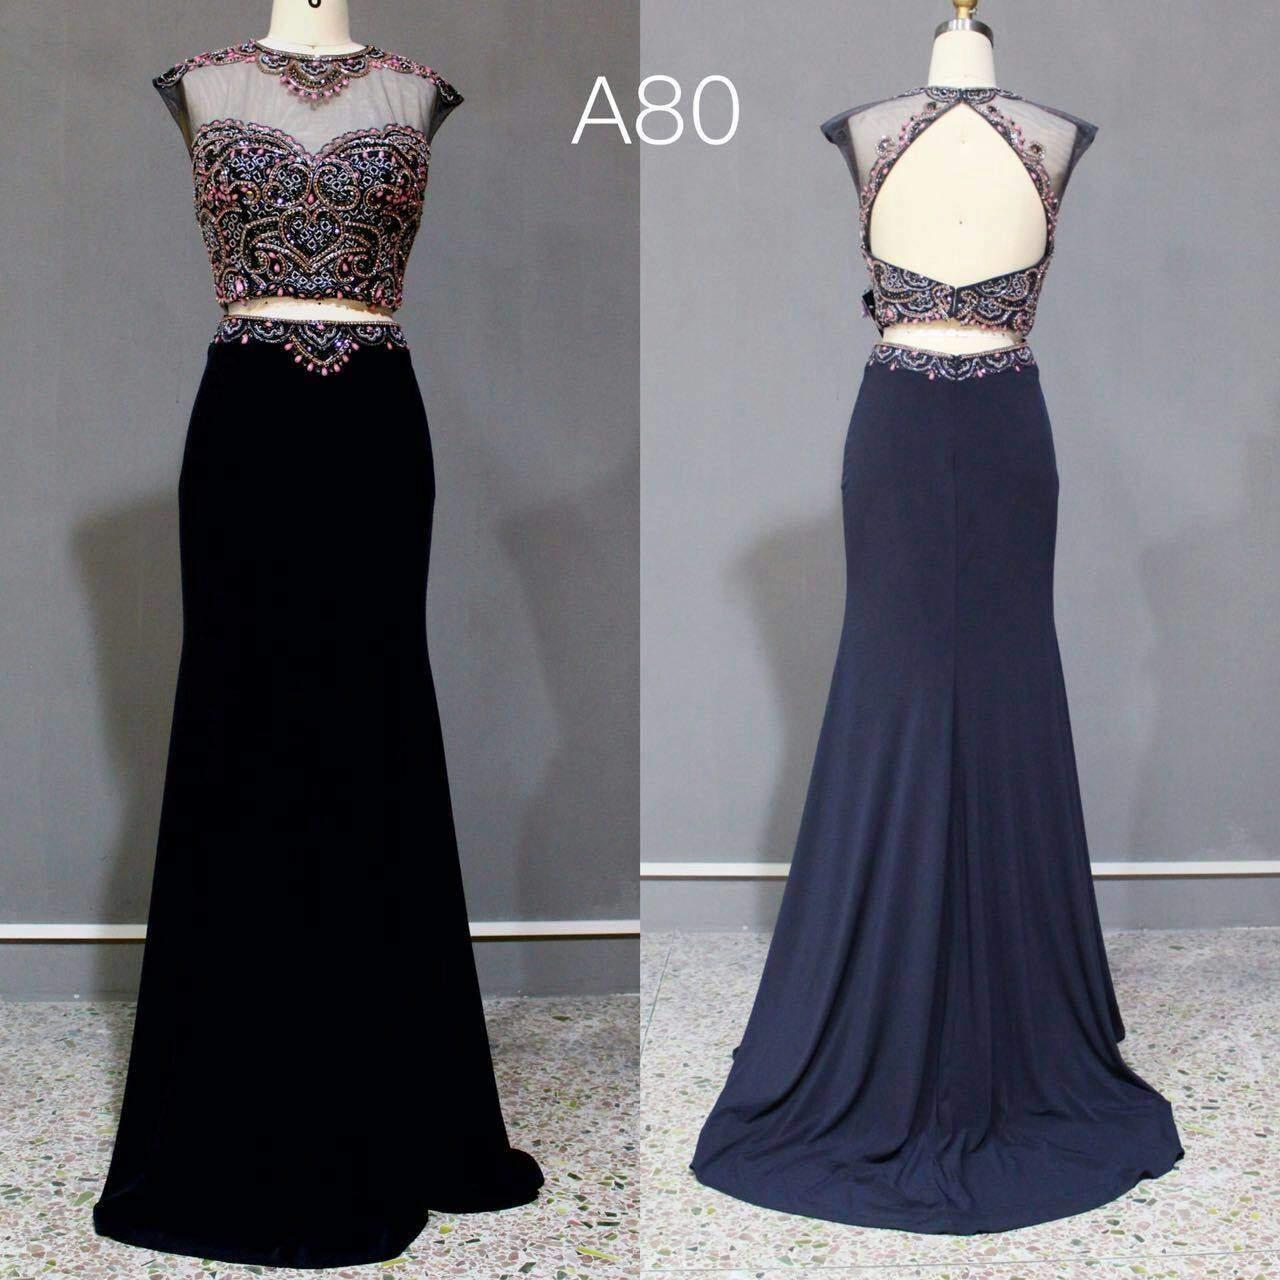 947780c319c Beaded Evening Wear Dresses - Darius Cordell Fashion Ltd